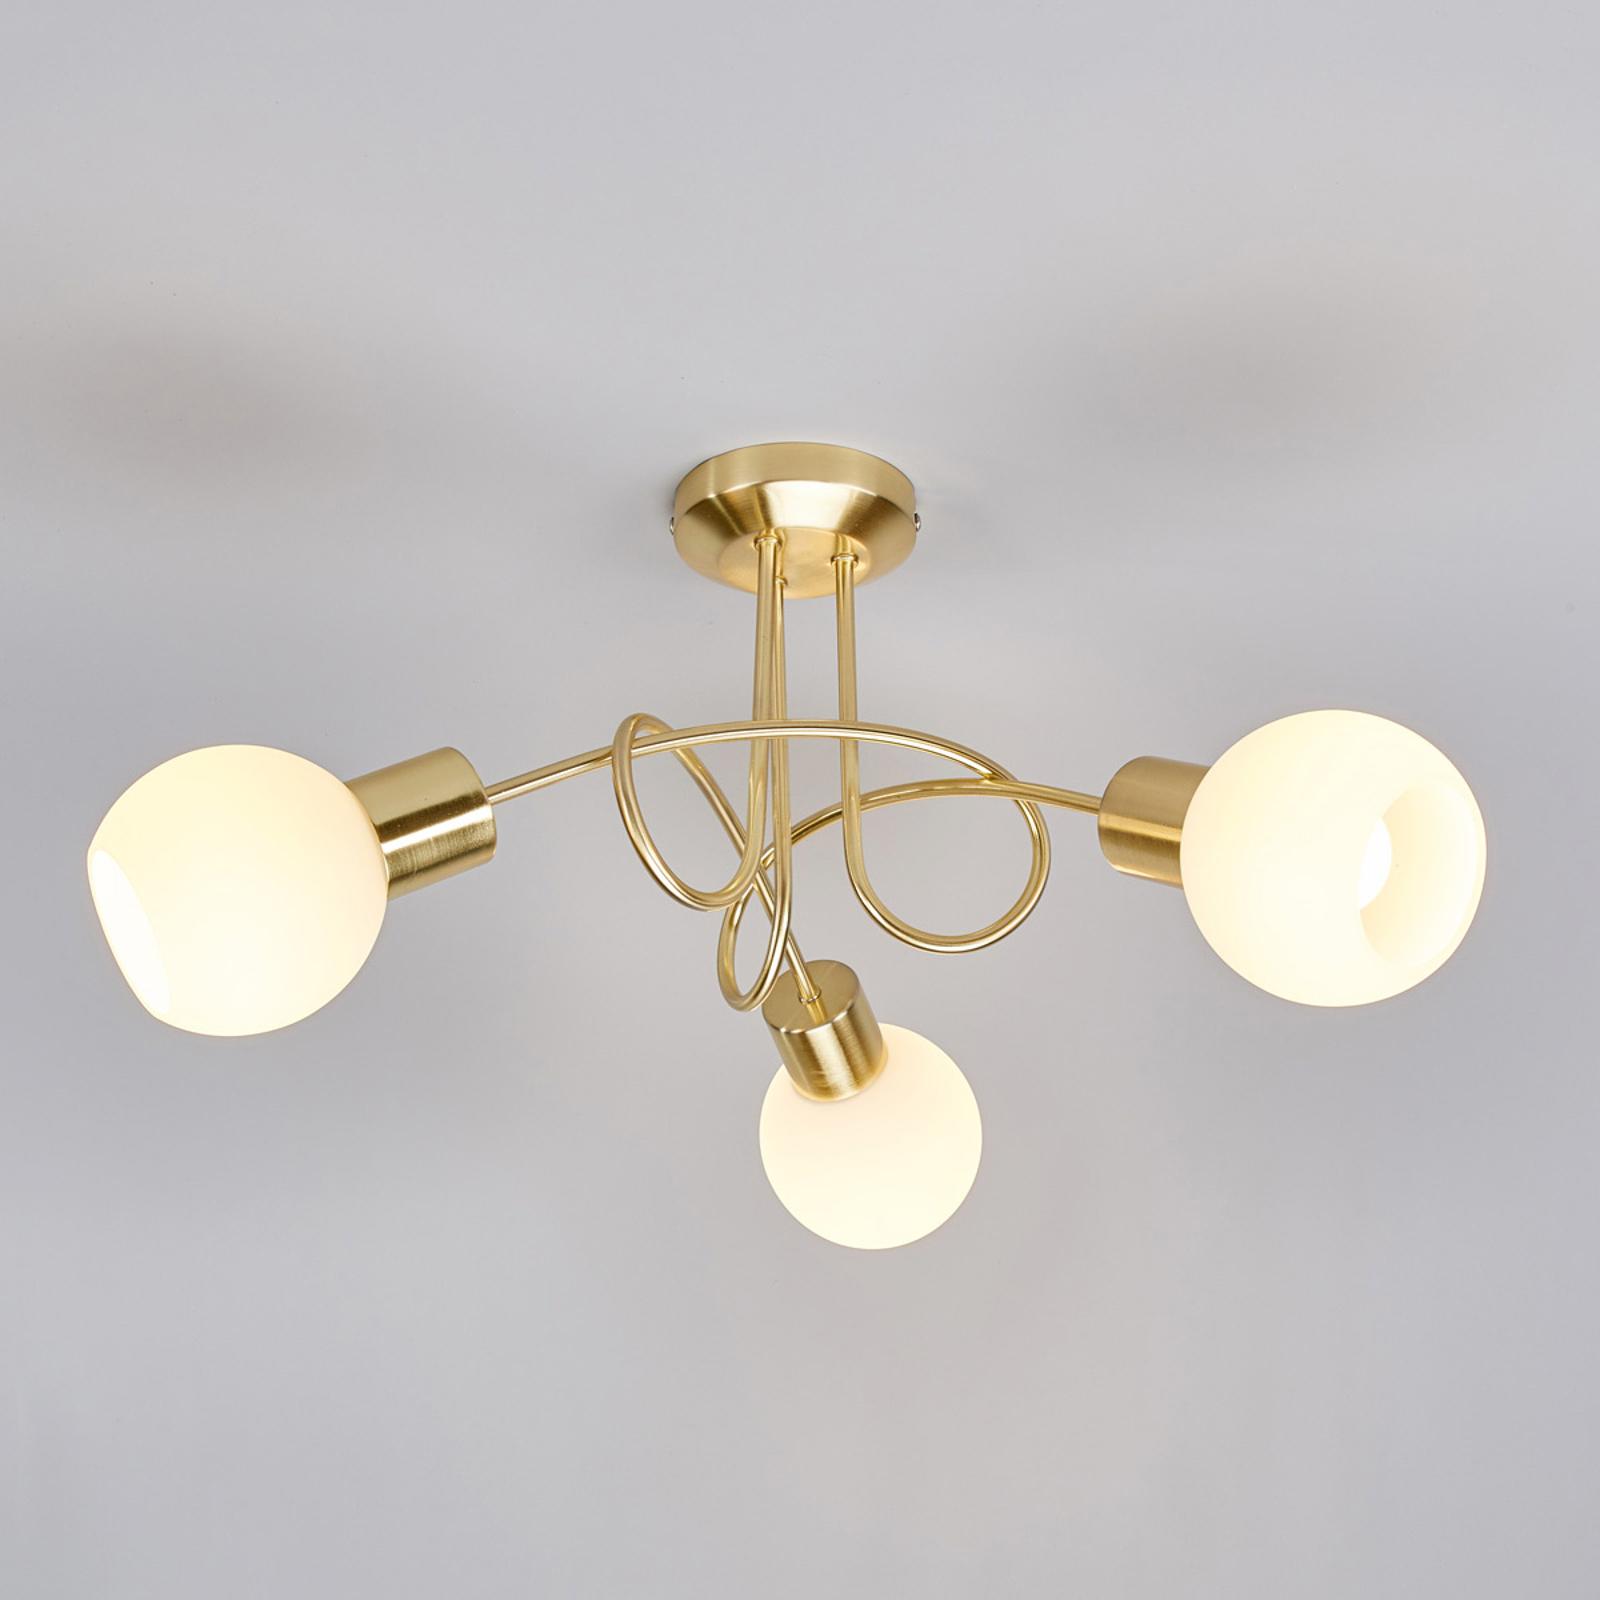 Lampa sufitowa LED ELAINA, mosiężna, 3-pkt.